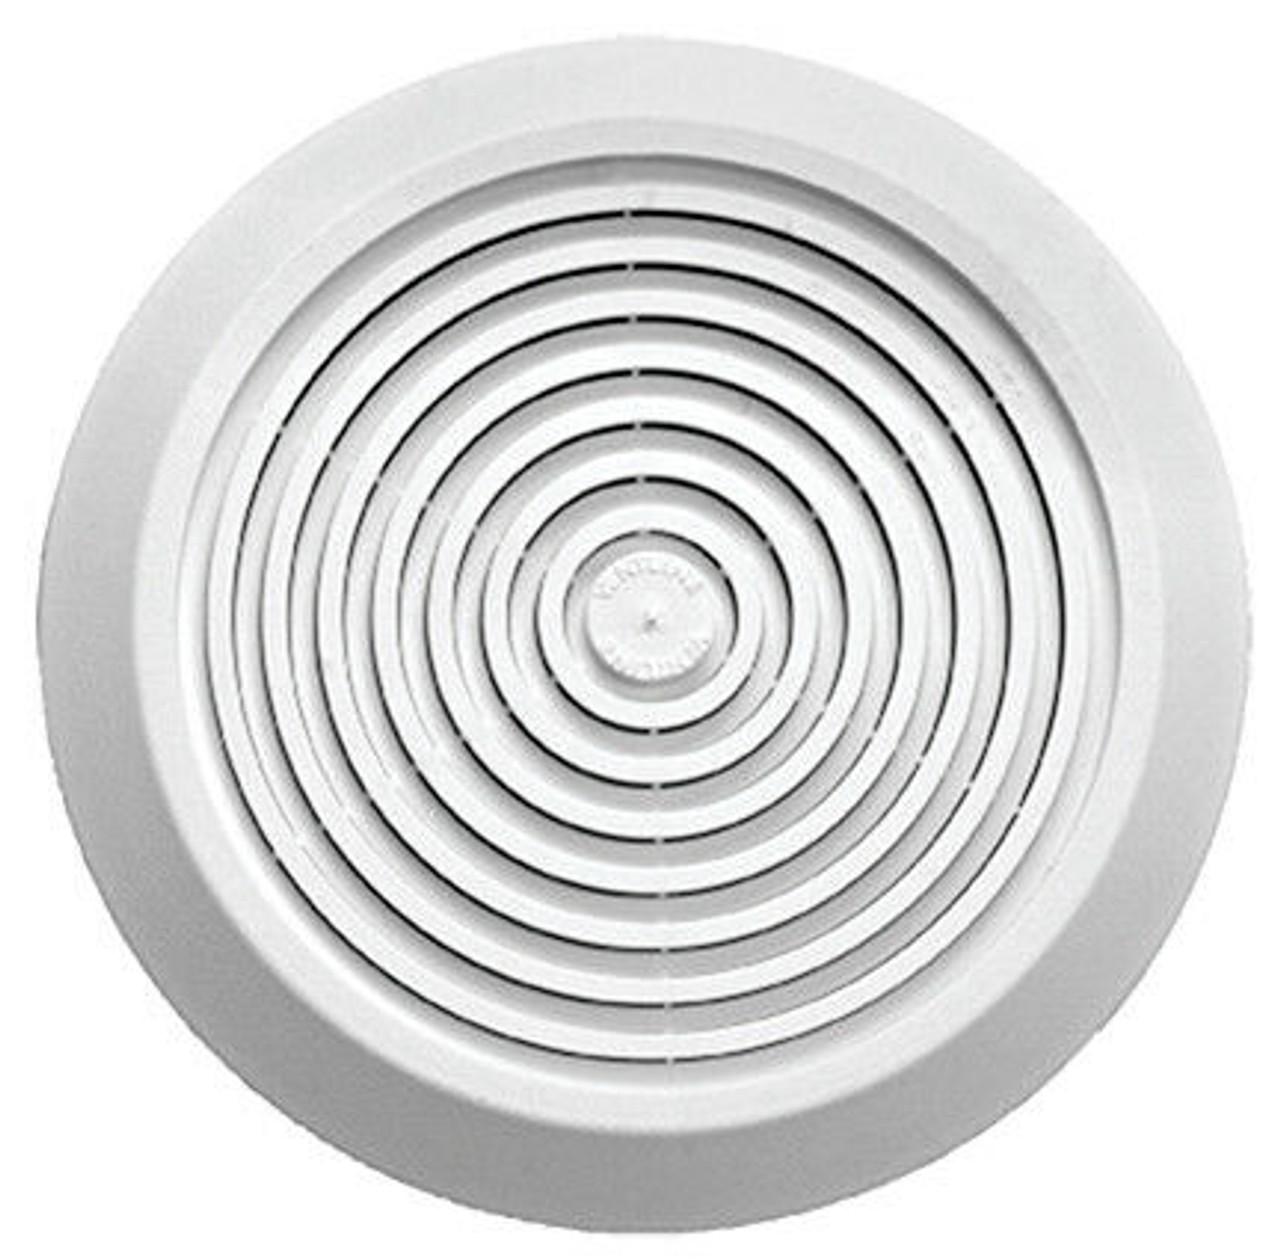 ventline bathroom ceiling exhaust fan grill